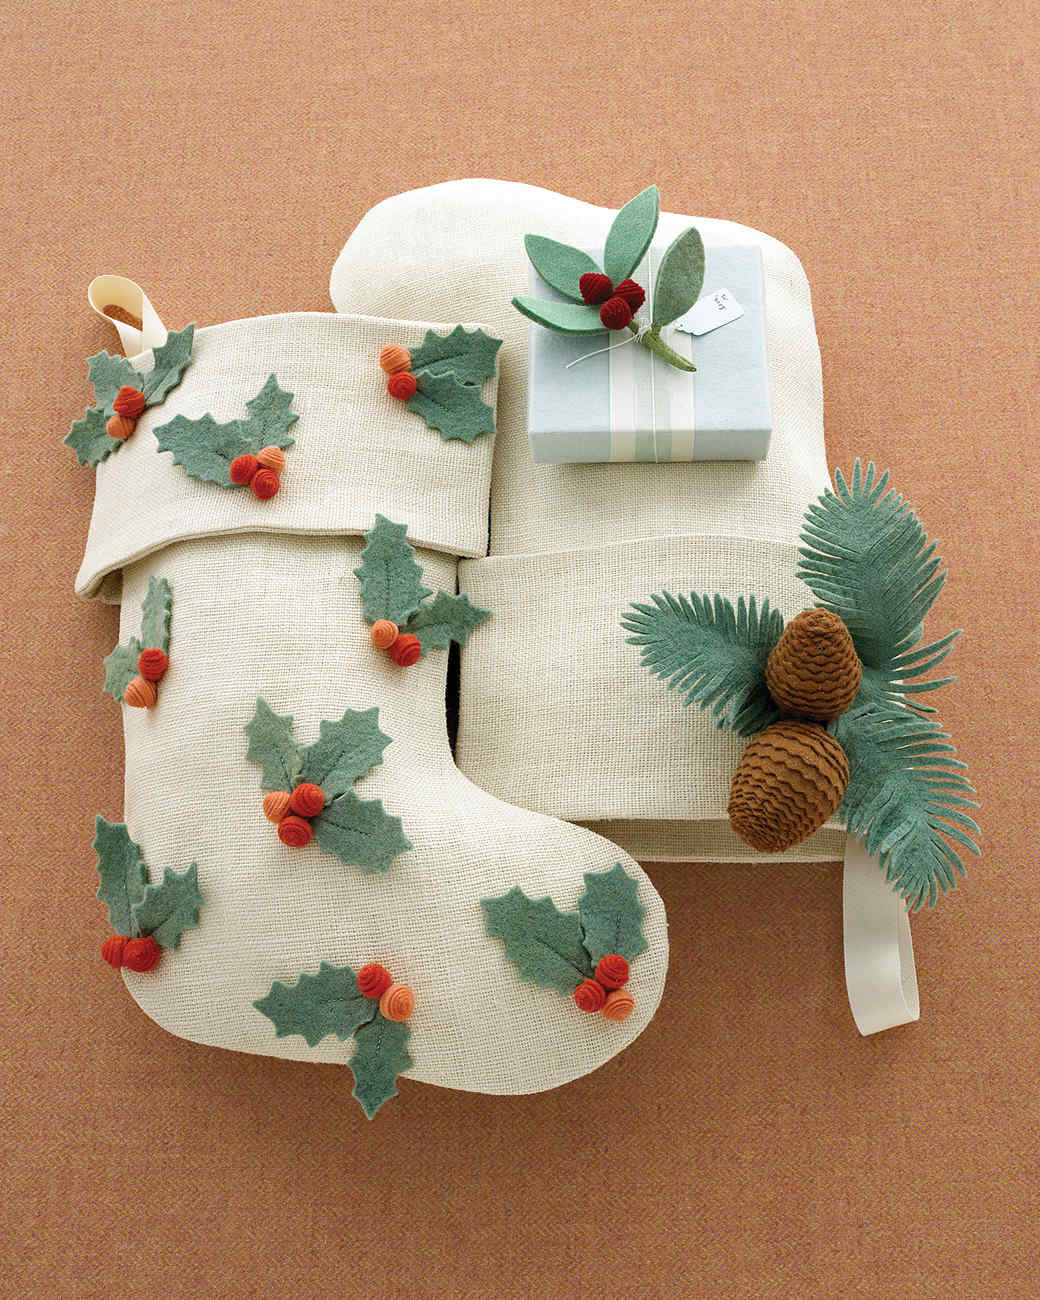 Handmade felt holly stockings